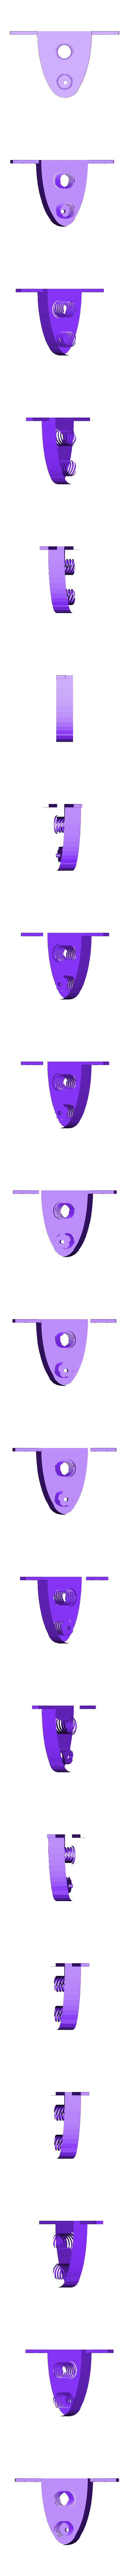 spool_cradel_crossbar_with_filament_guide.stl Download free STL file Filament Spool SyStem • 3D printable object, jimjax